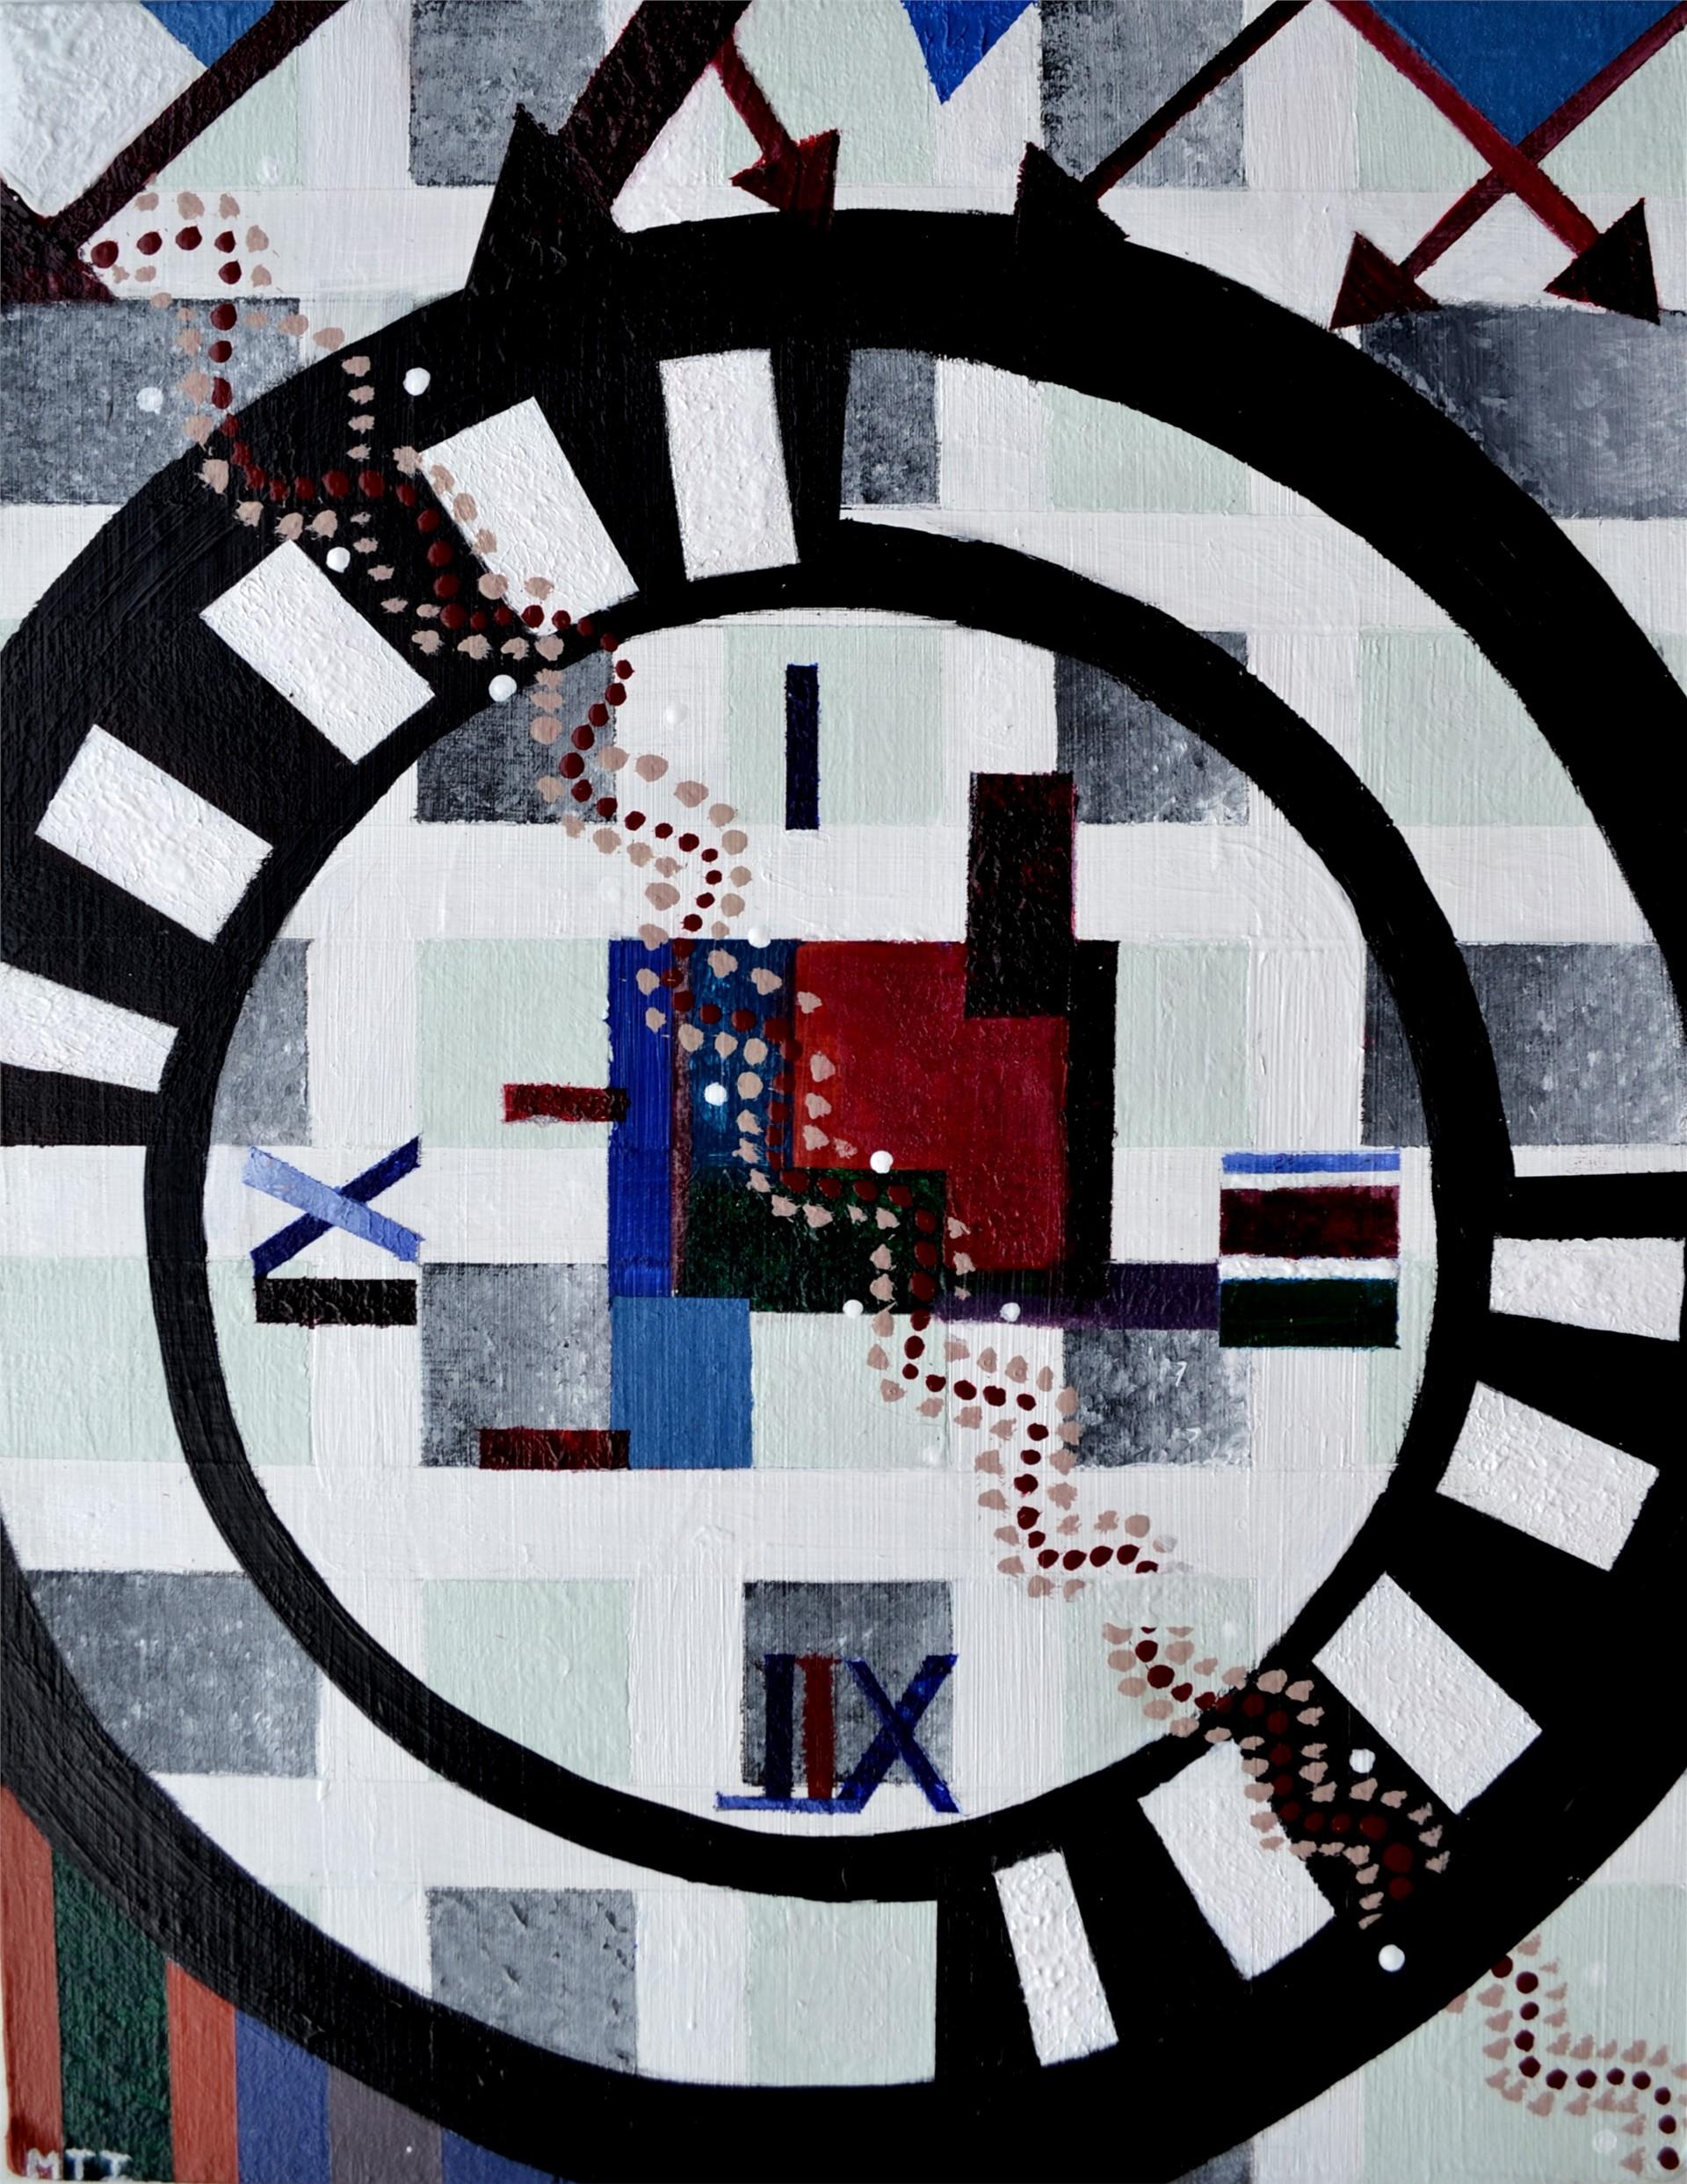 MARRIAM IQBAL, Timeless, acrylic on plasterboard, 14 x 10.5, 2015